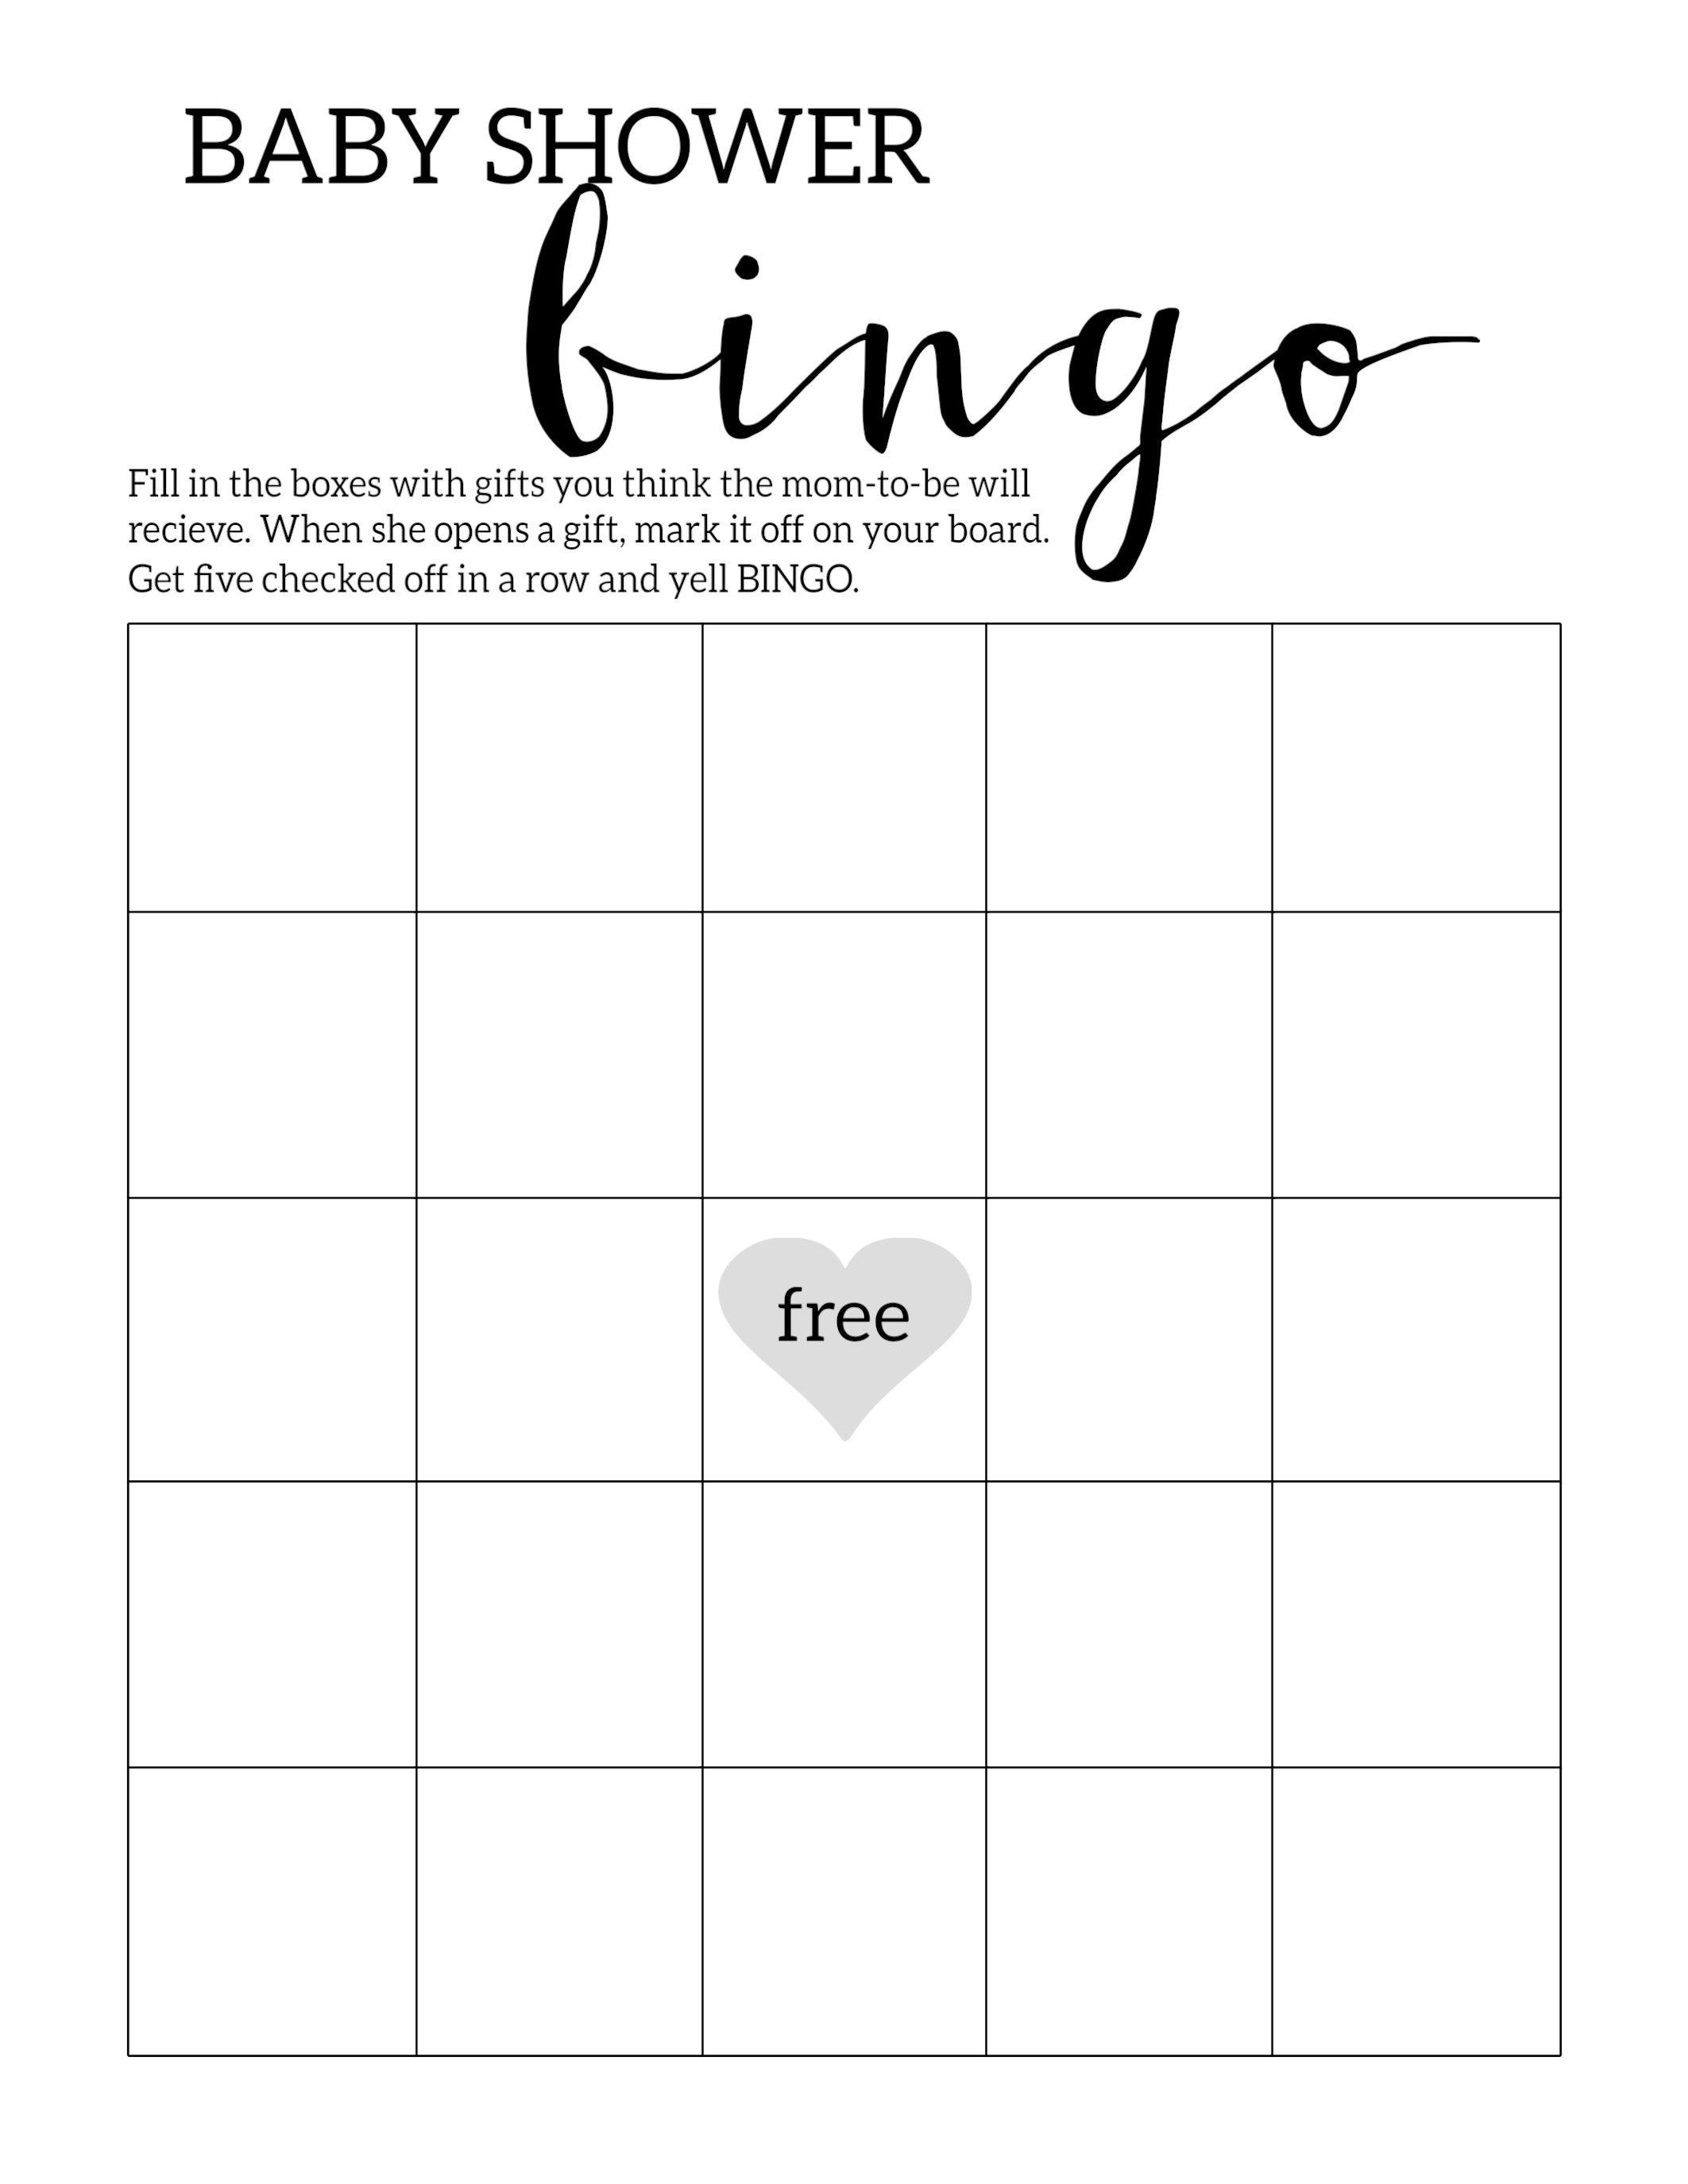 Baby Shower Bingo Printable Cards Template | Baby Shower | Baby - Baby Bingo Free Printable Template